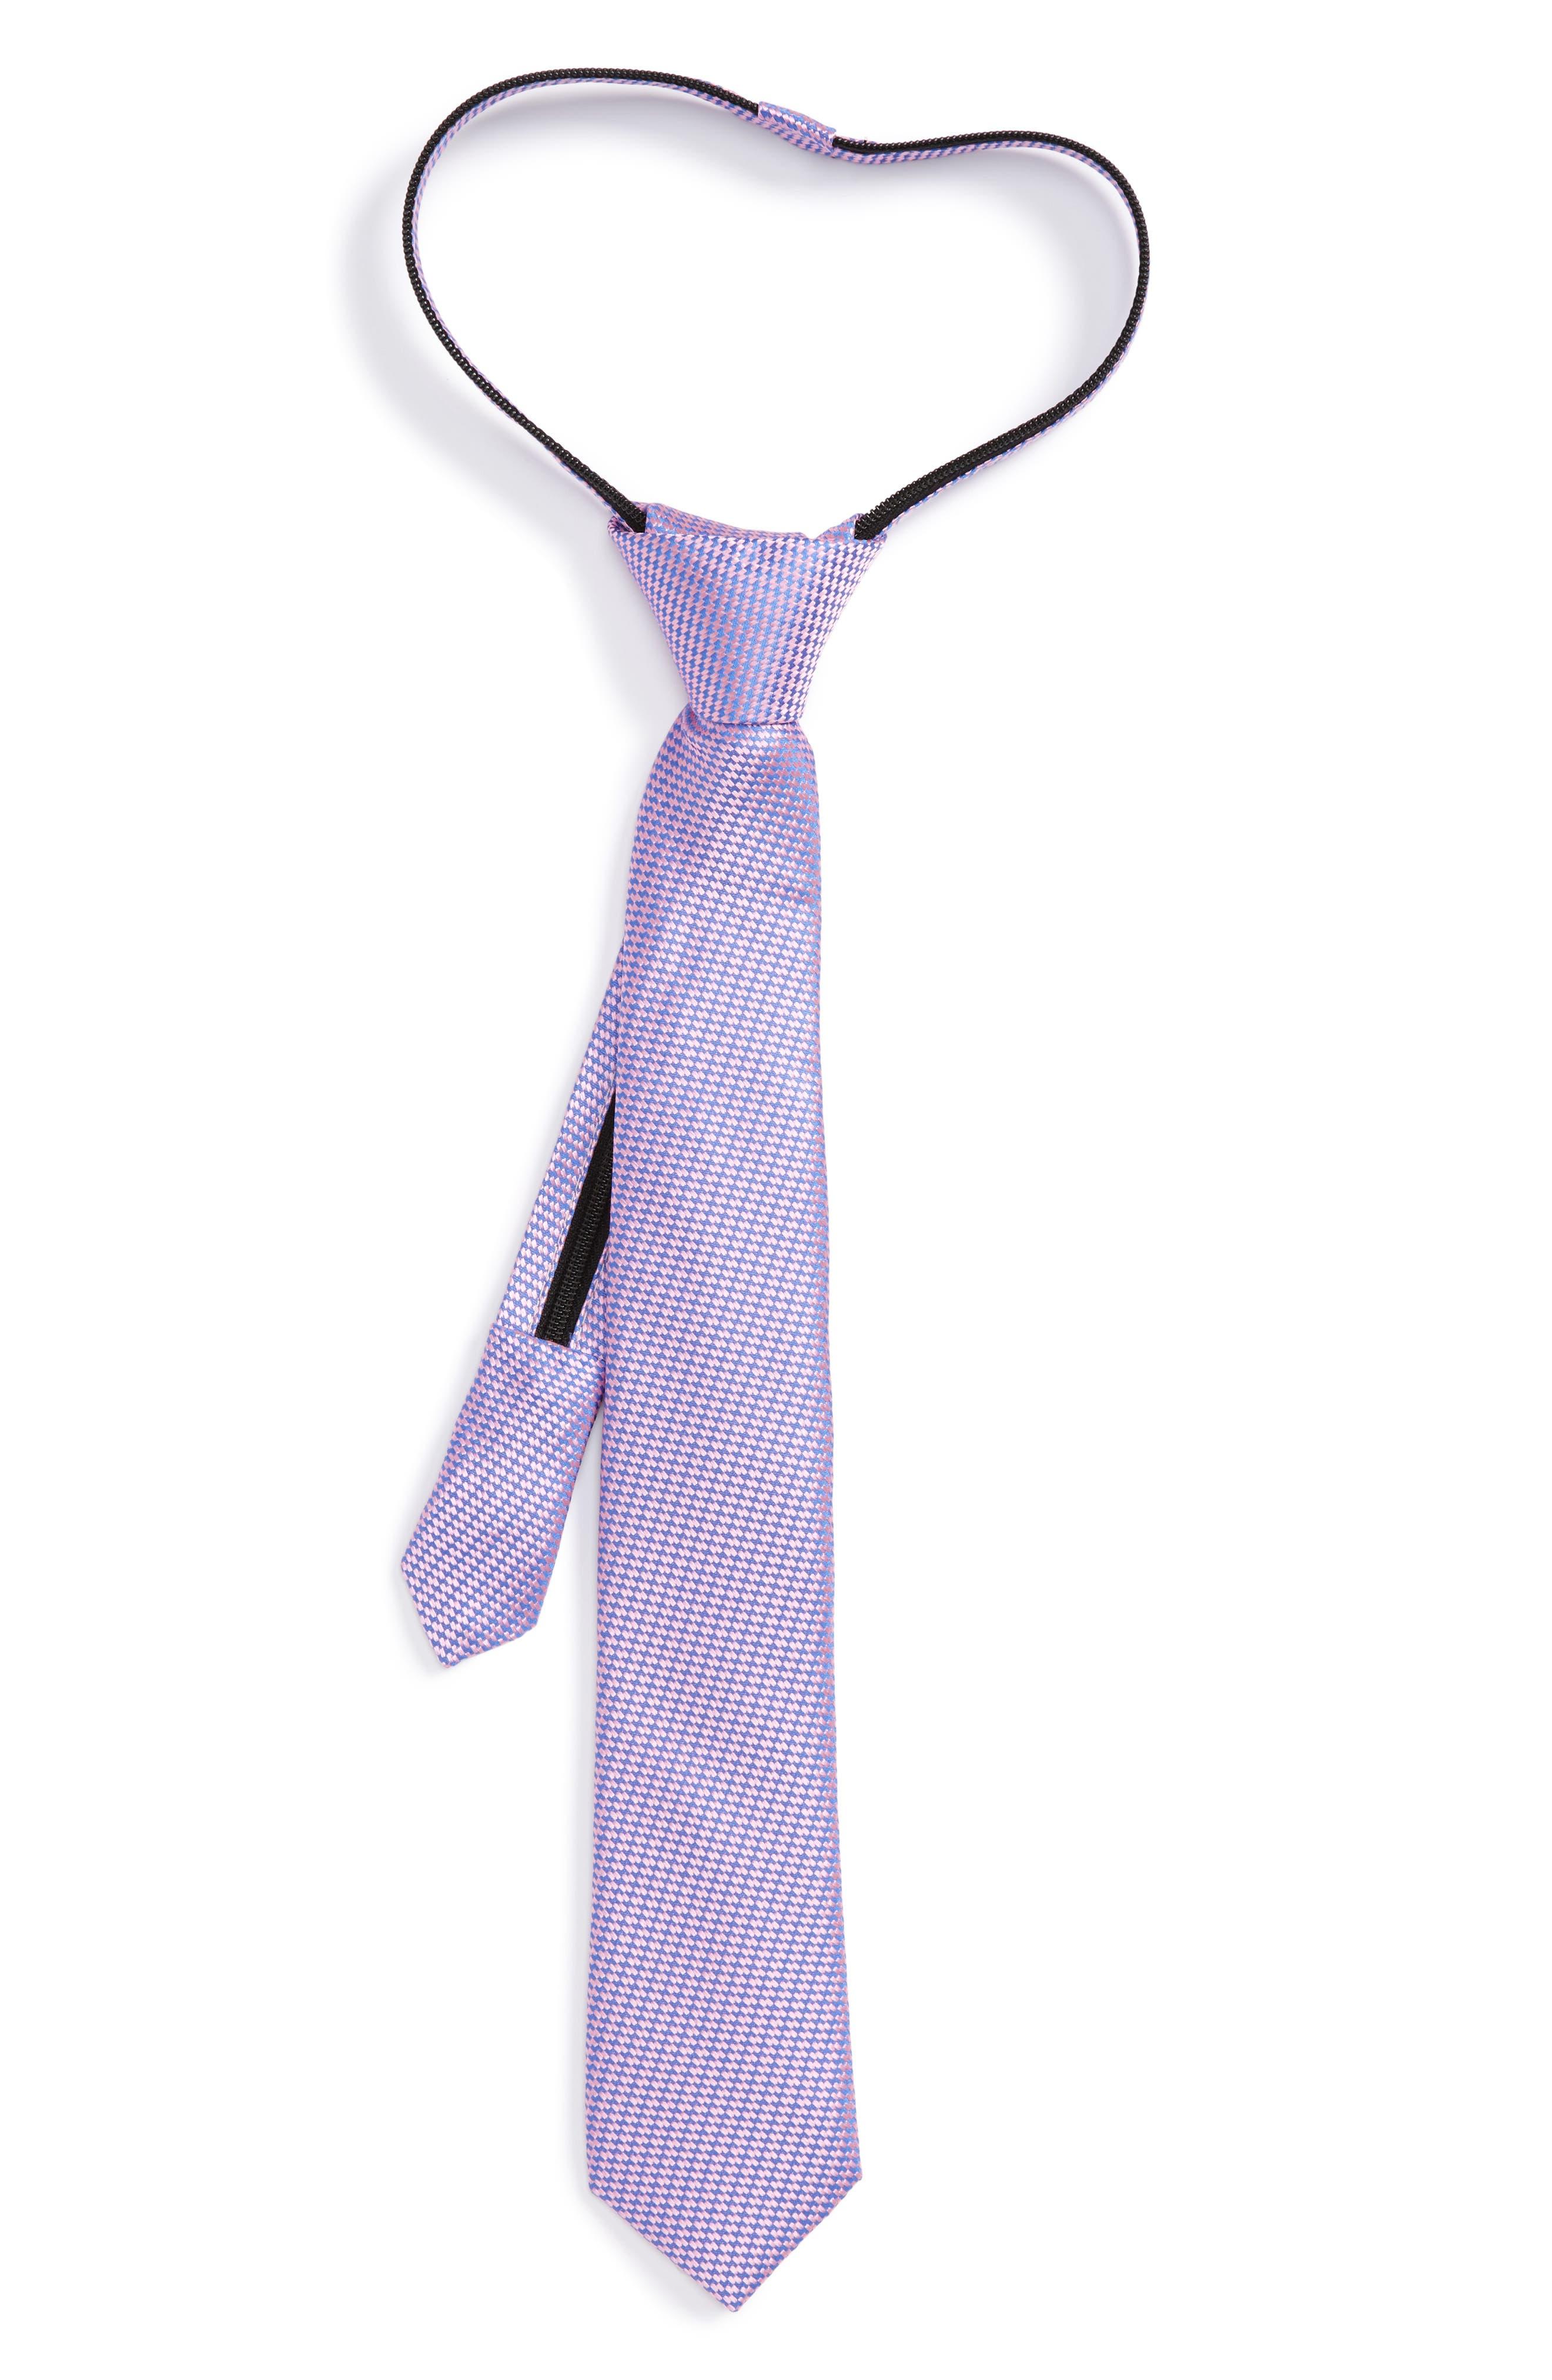 Alternate Image 1 Selected - Nordstrom Textured Silk Zipper Tie (Big Boys)